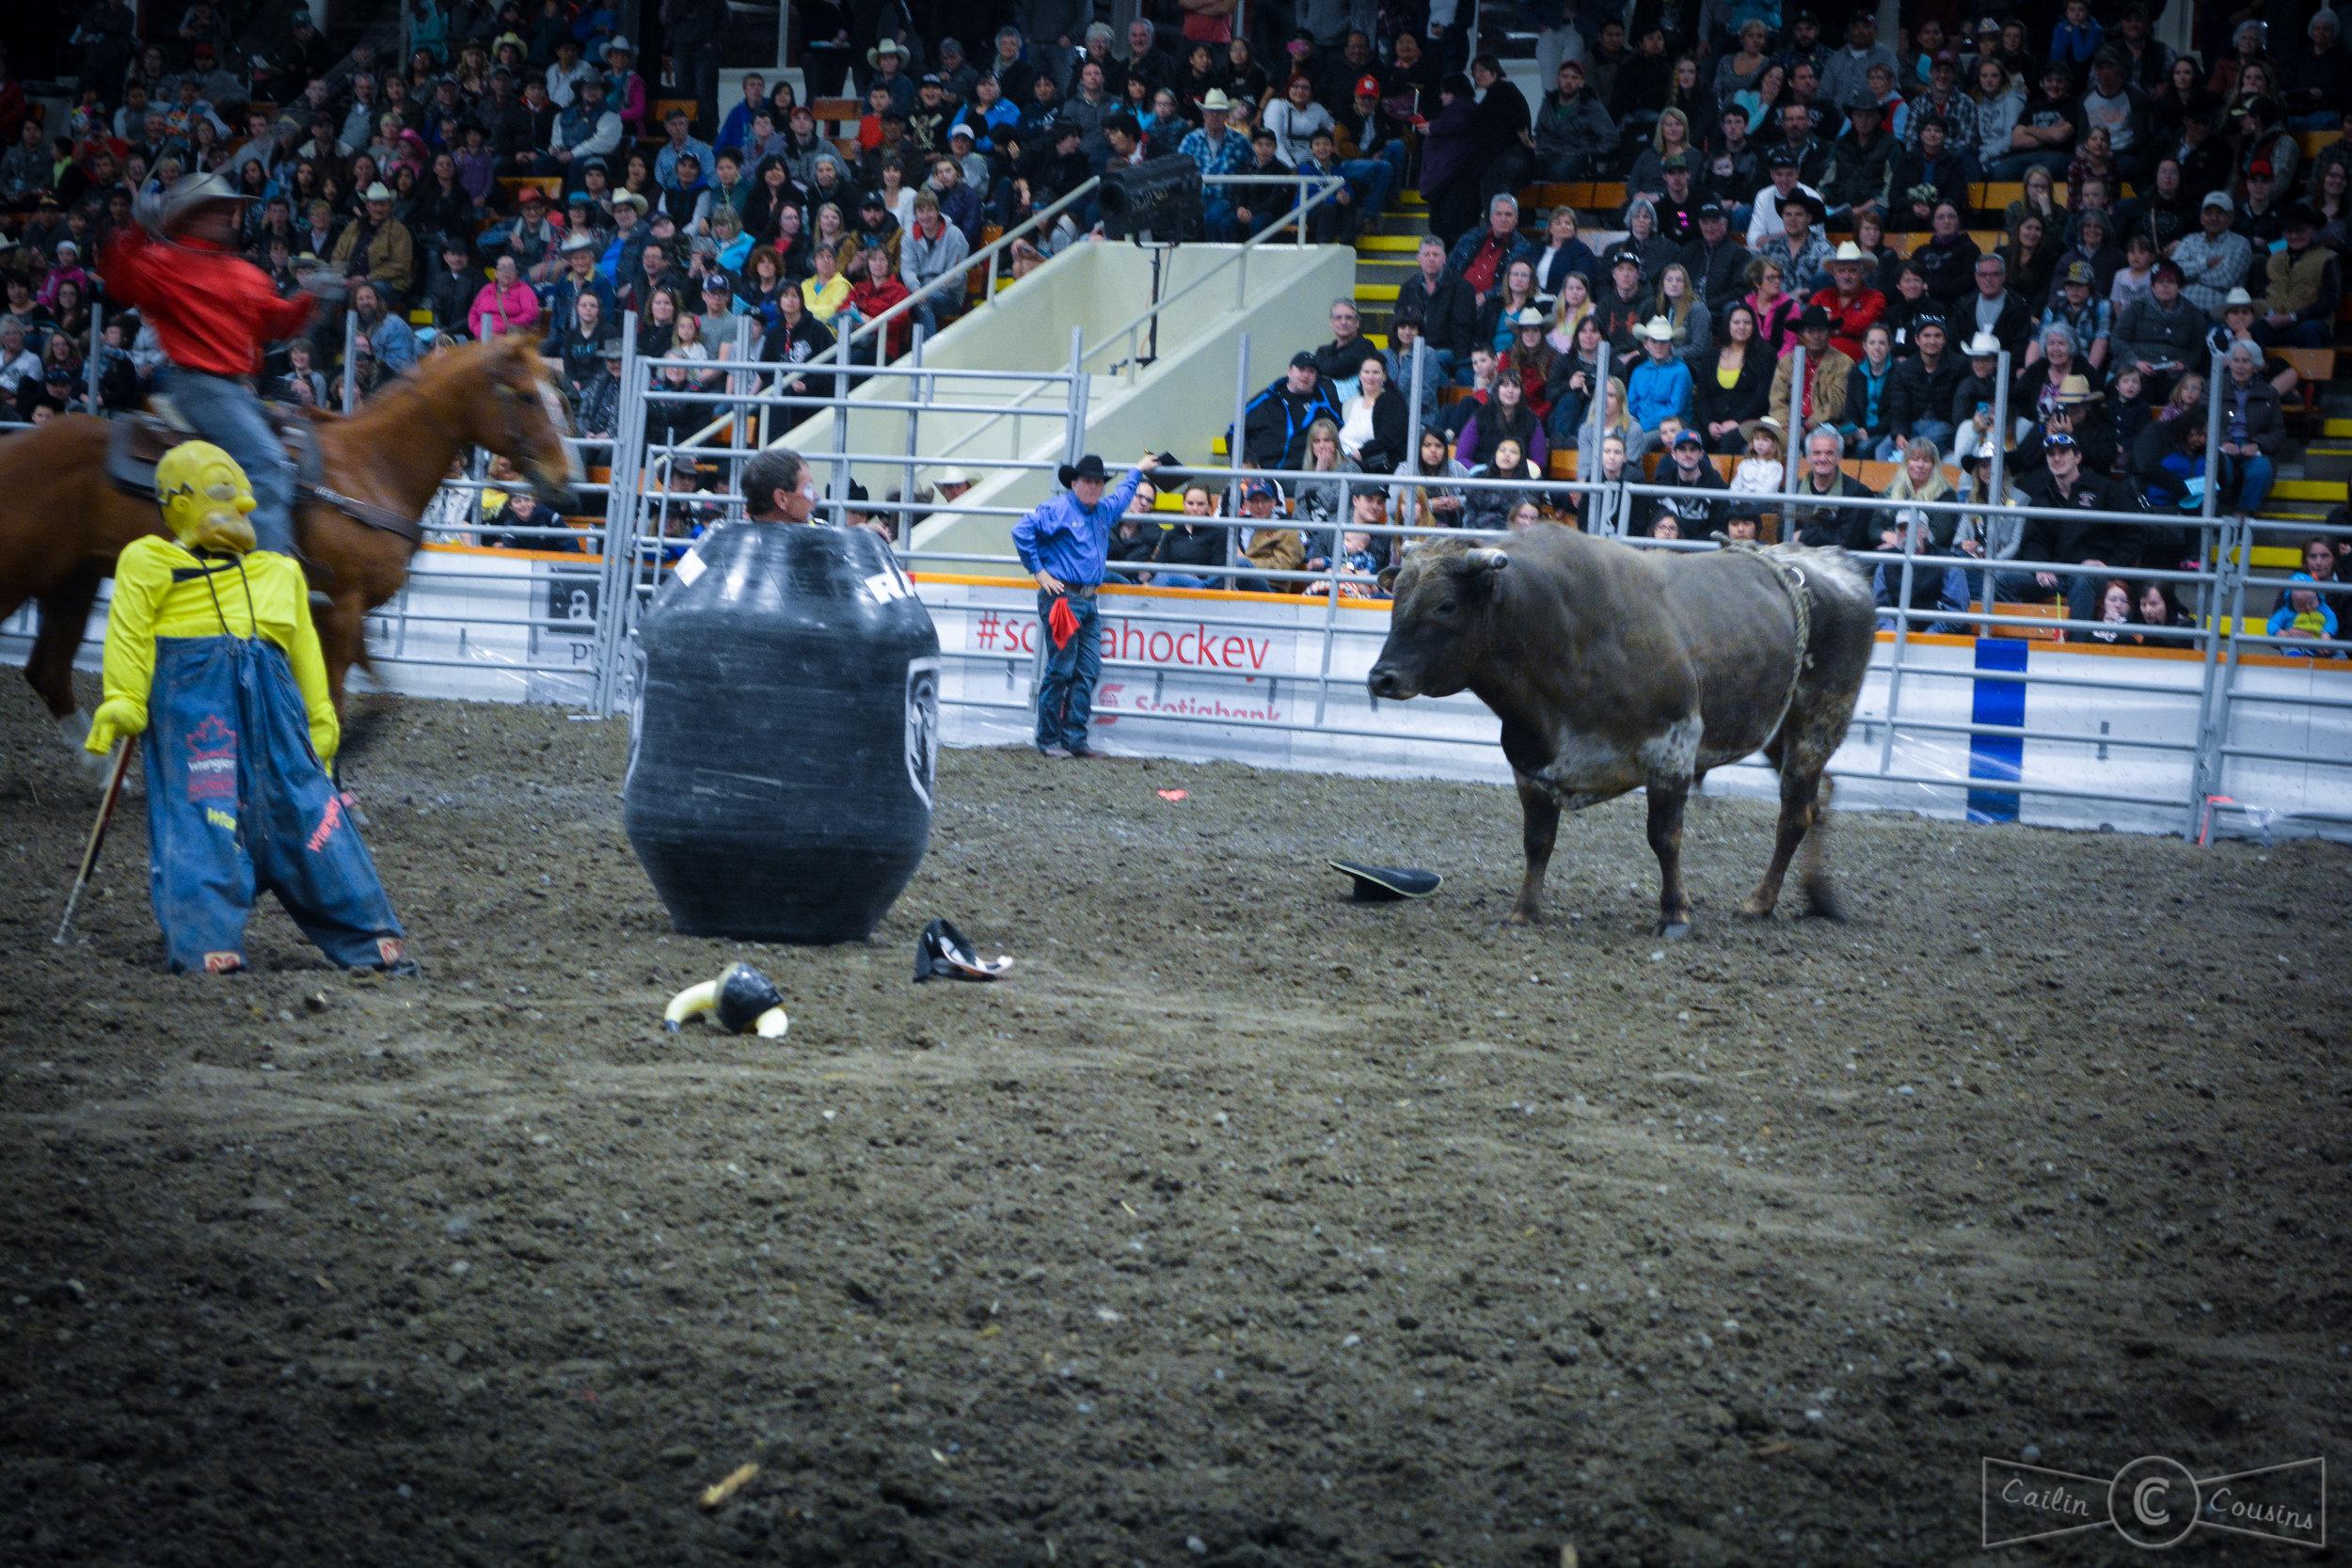 051715_rodeo_cc-2.jpg